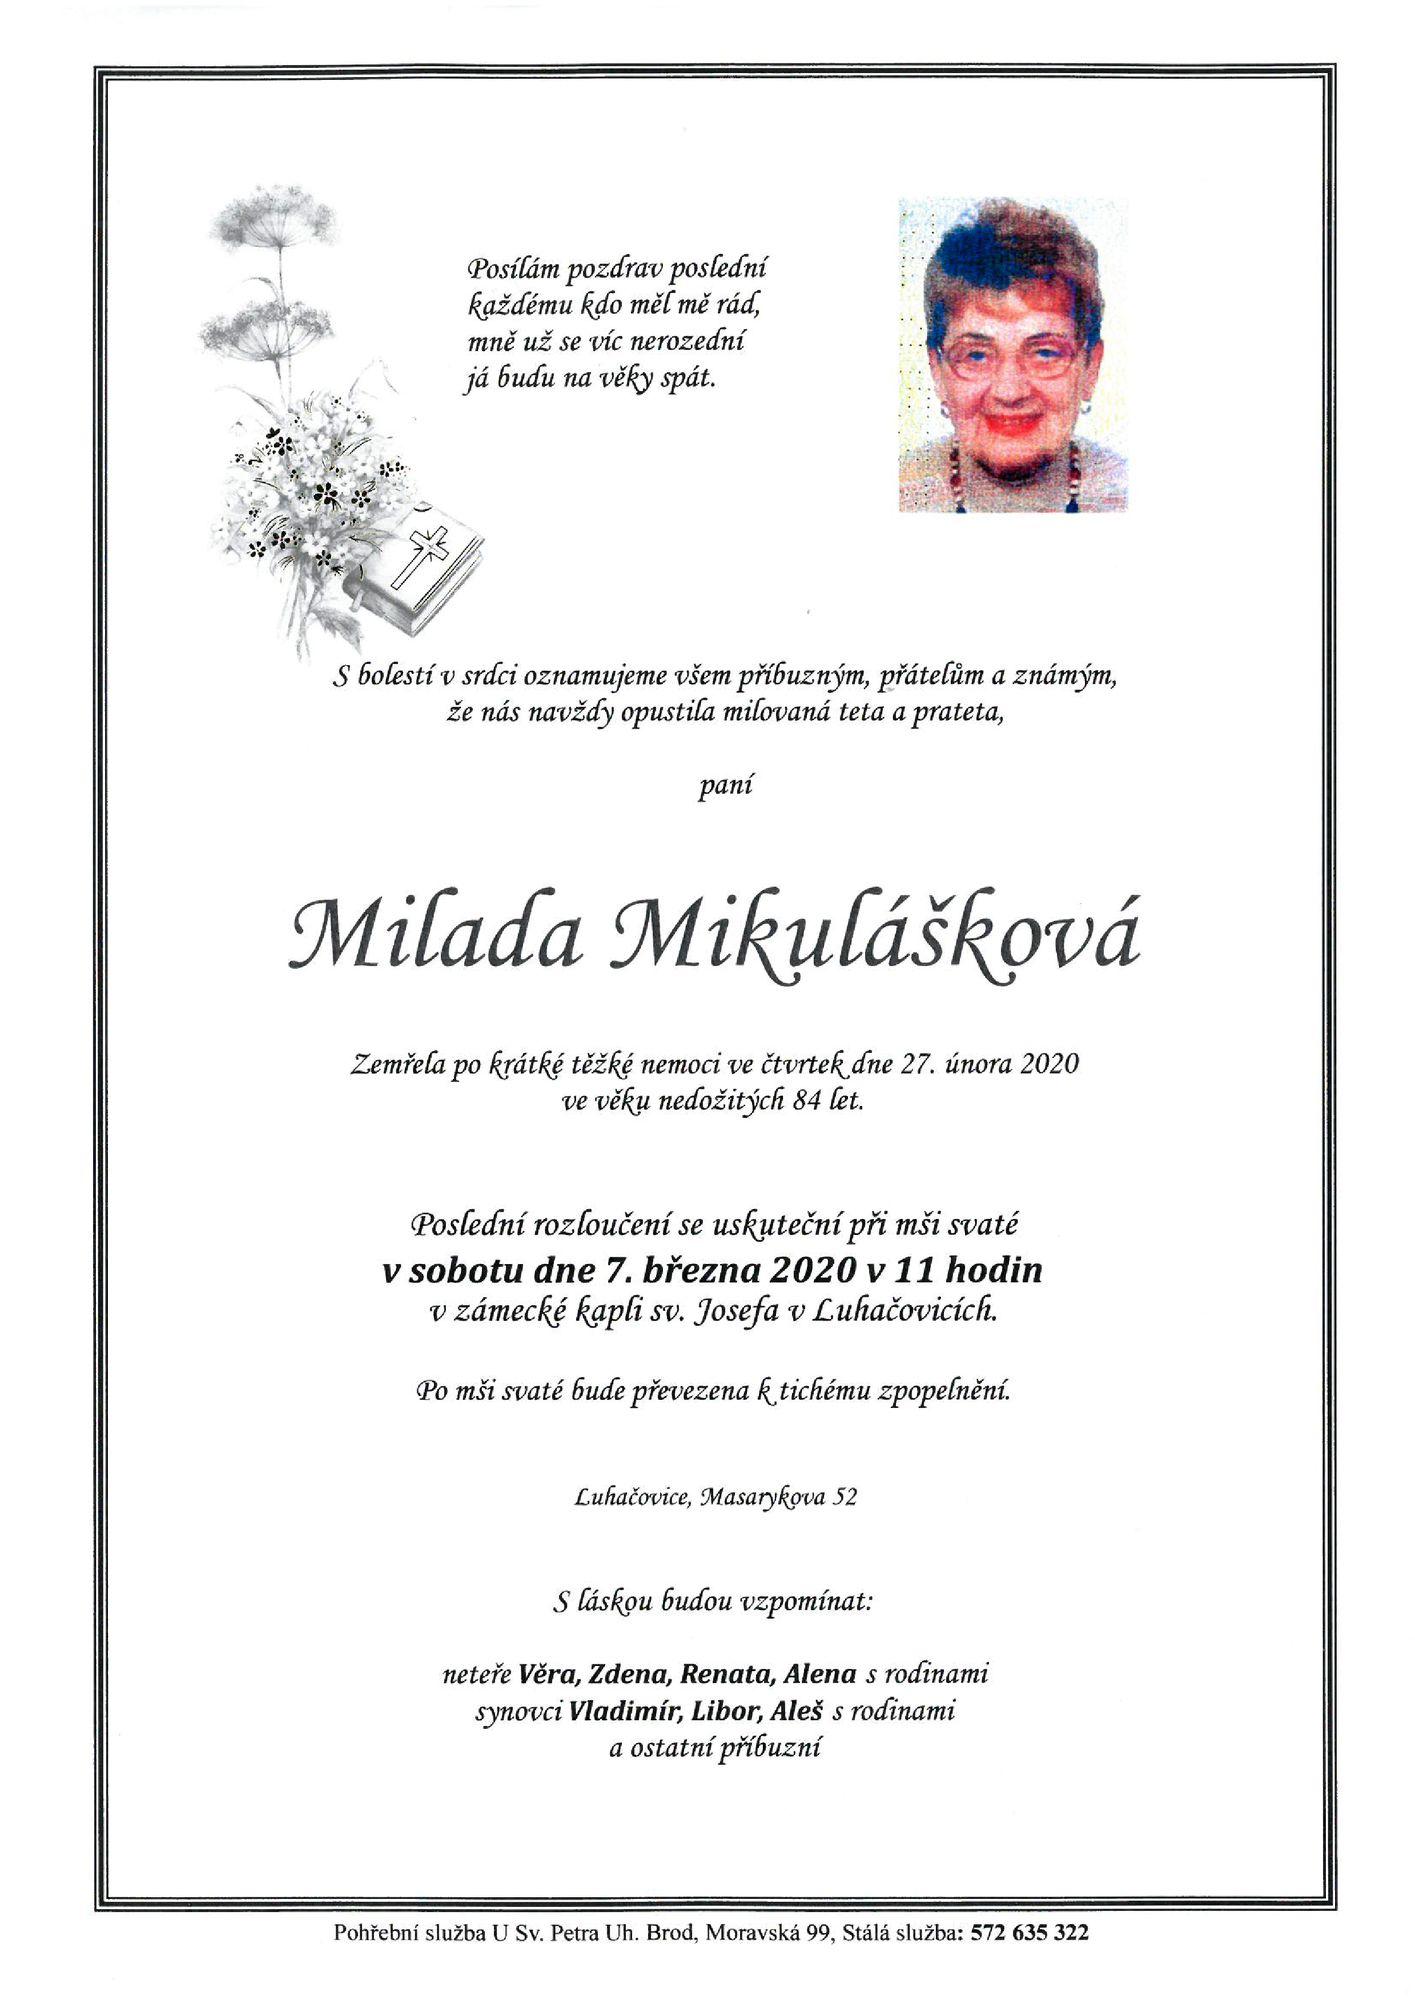 Milada Mikulášková